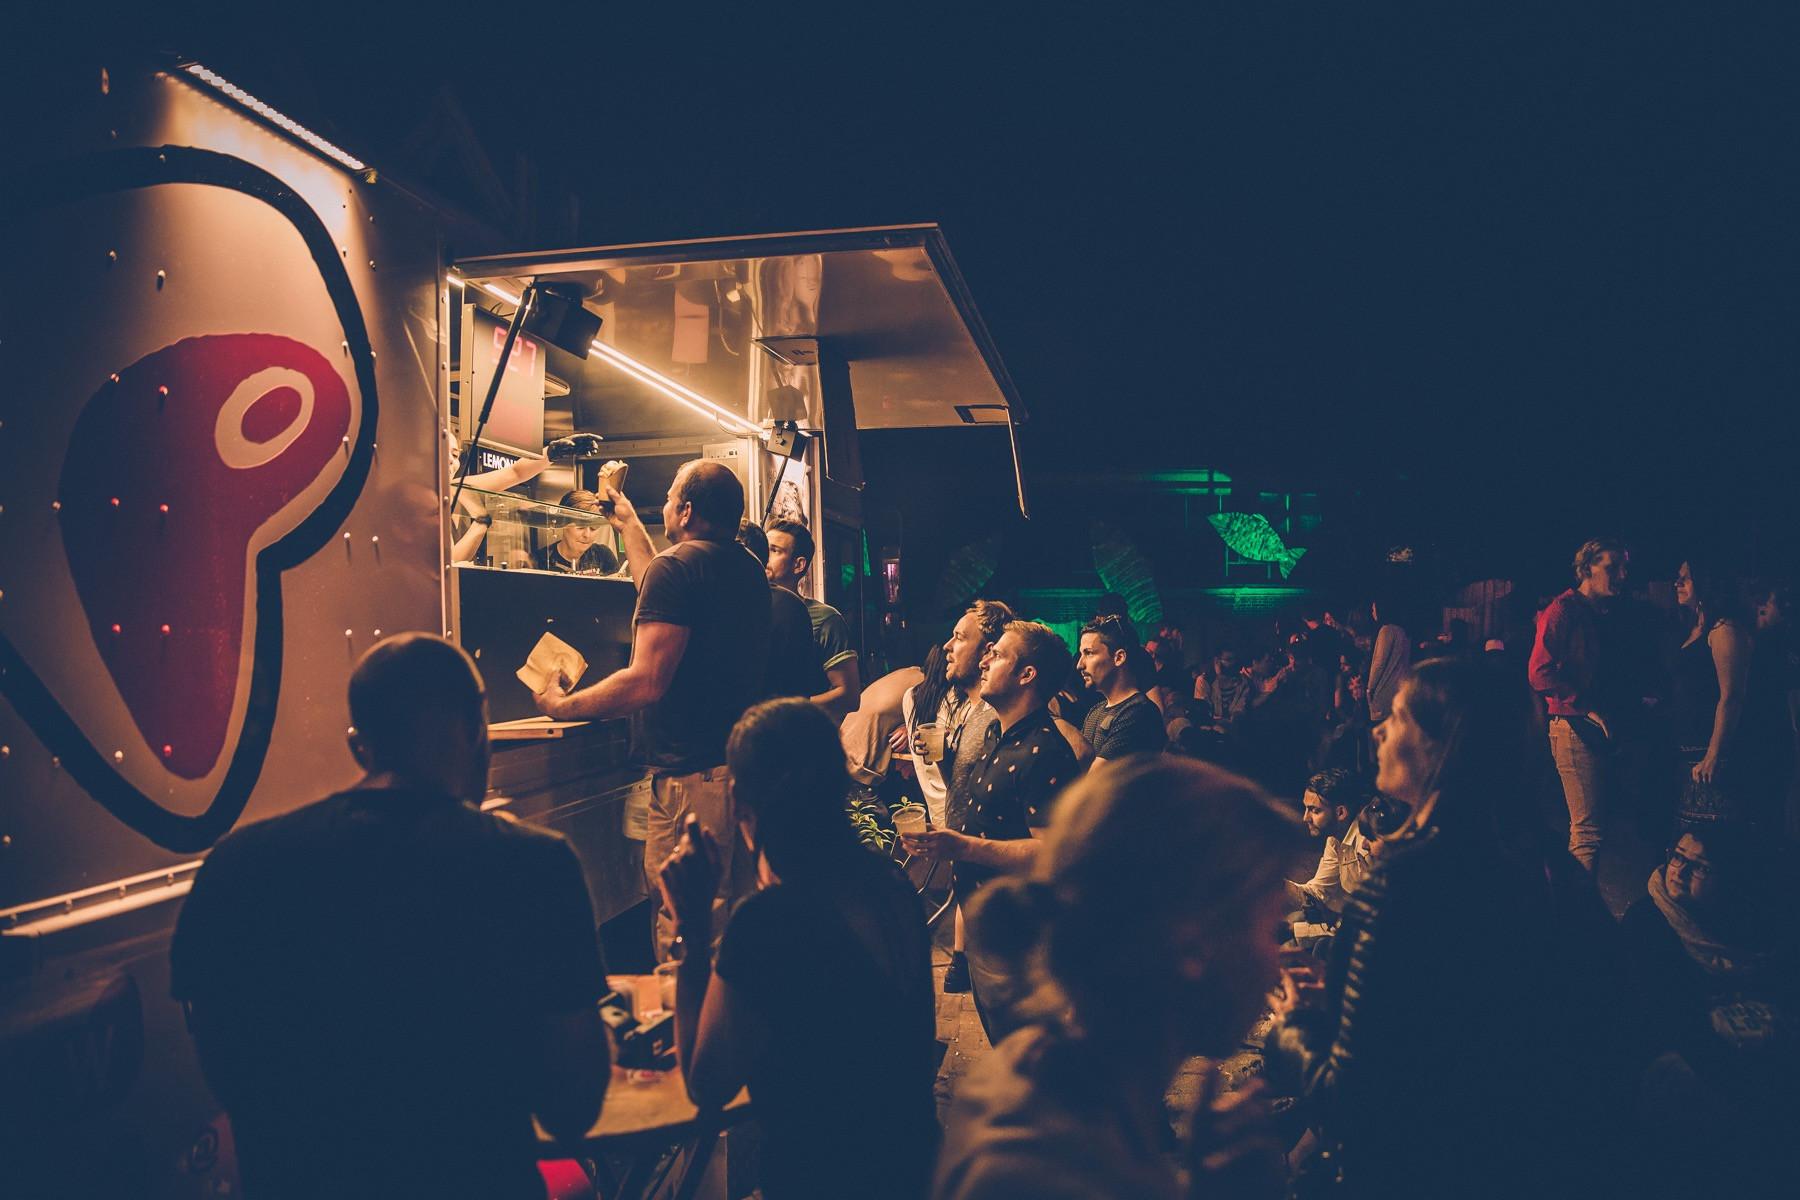 Food Truck Catering für 150 Personen